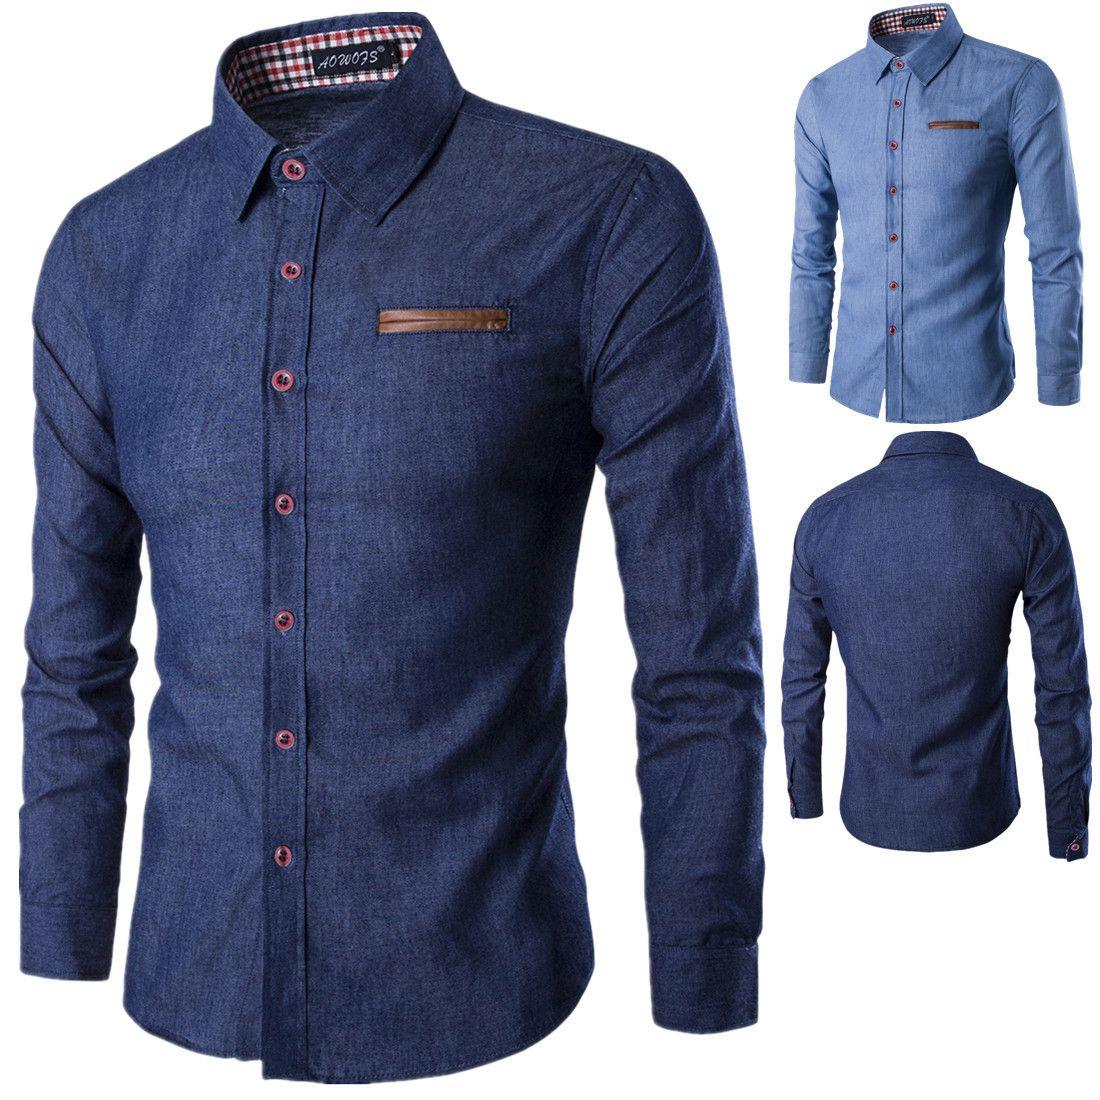 f805a869b56d 2019 Spring Long Sleeve Denim Shirts Men Shirt Slim Fit Mens Jeans Shirts  Brand Camsia Masculine M 3XL From Xunmi